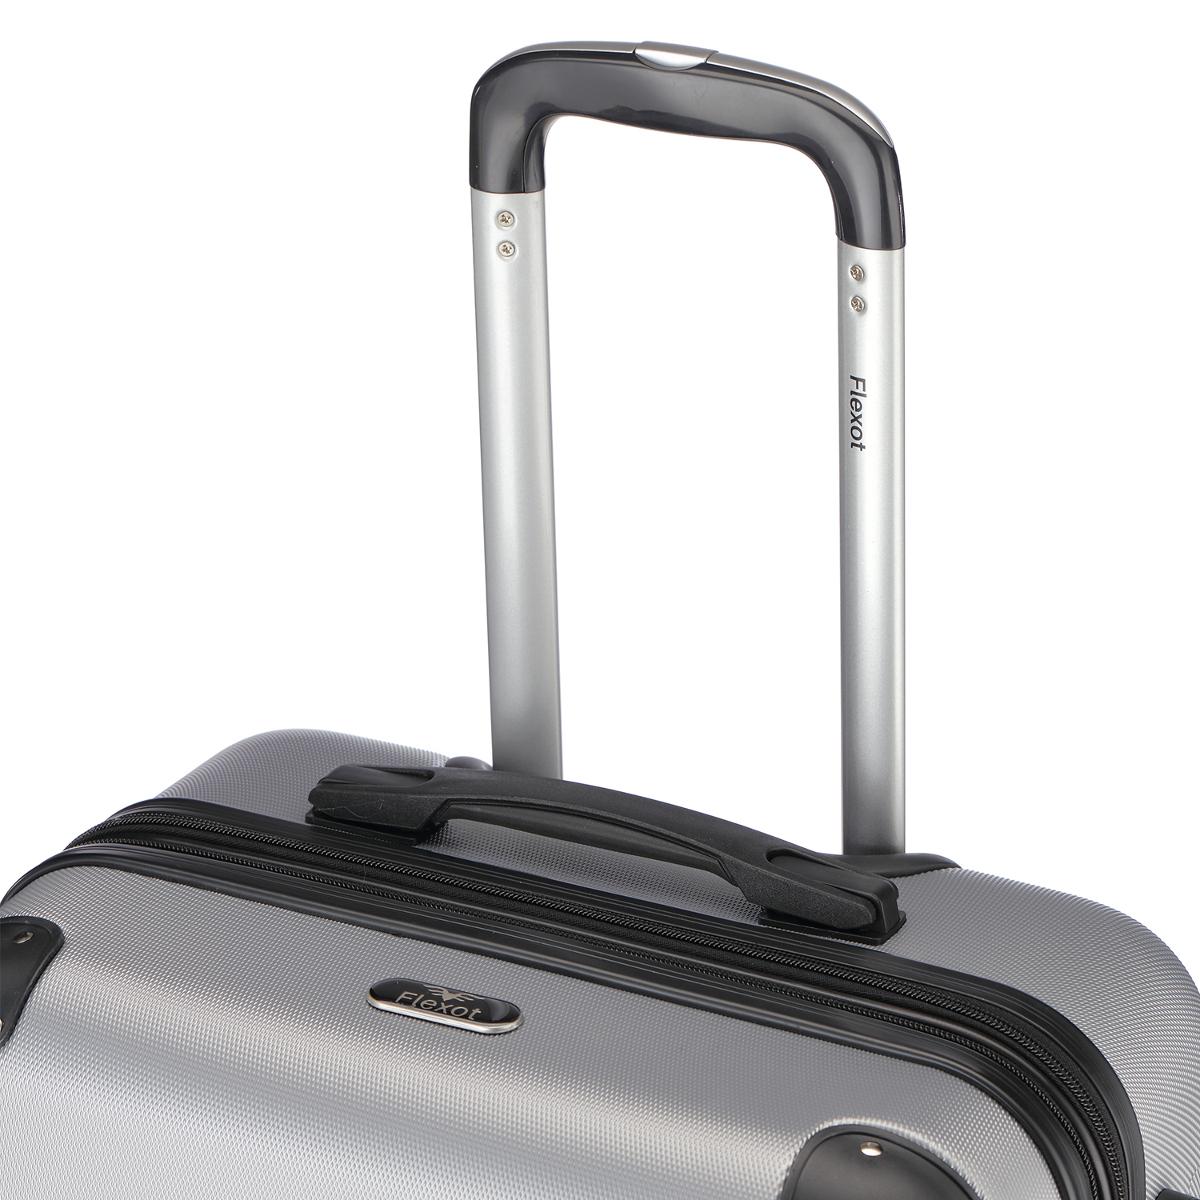 Koffer-Flexot-2045-Hartschalenkoffer-Trolley-Kofferset-Reisekoffer-M-L-XL-Set Indexbild 77